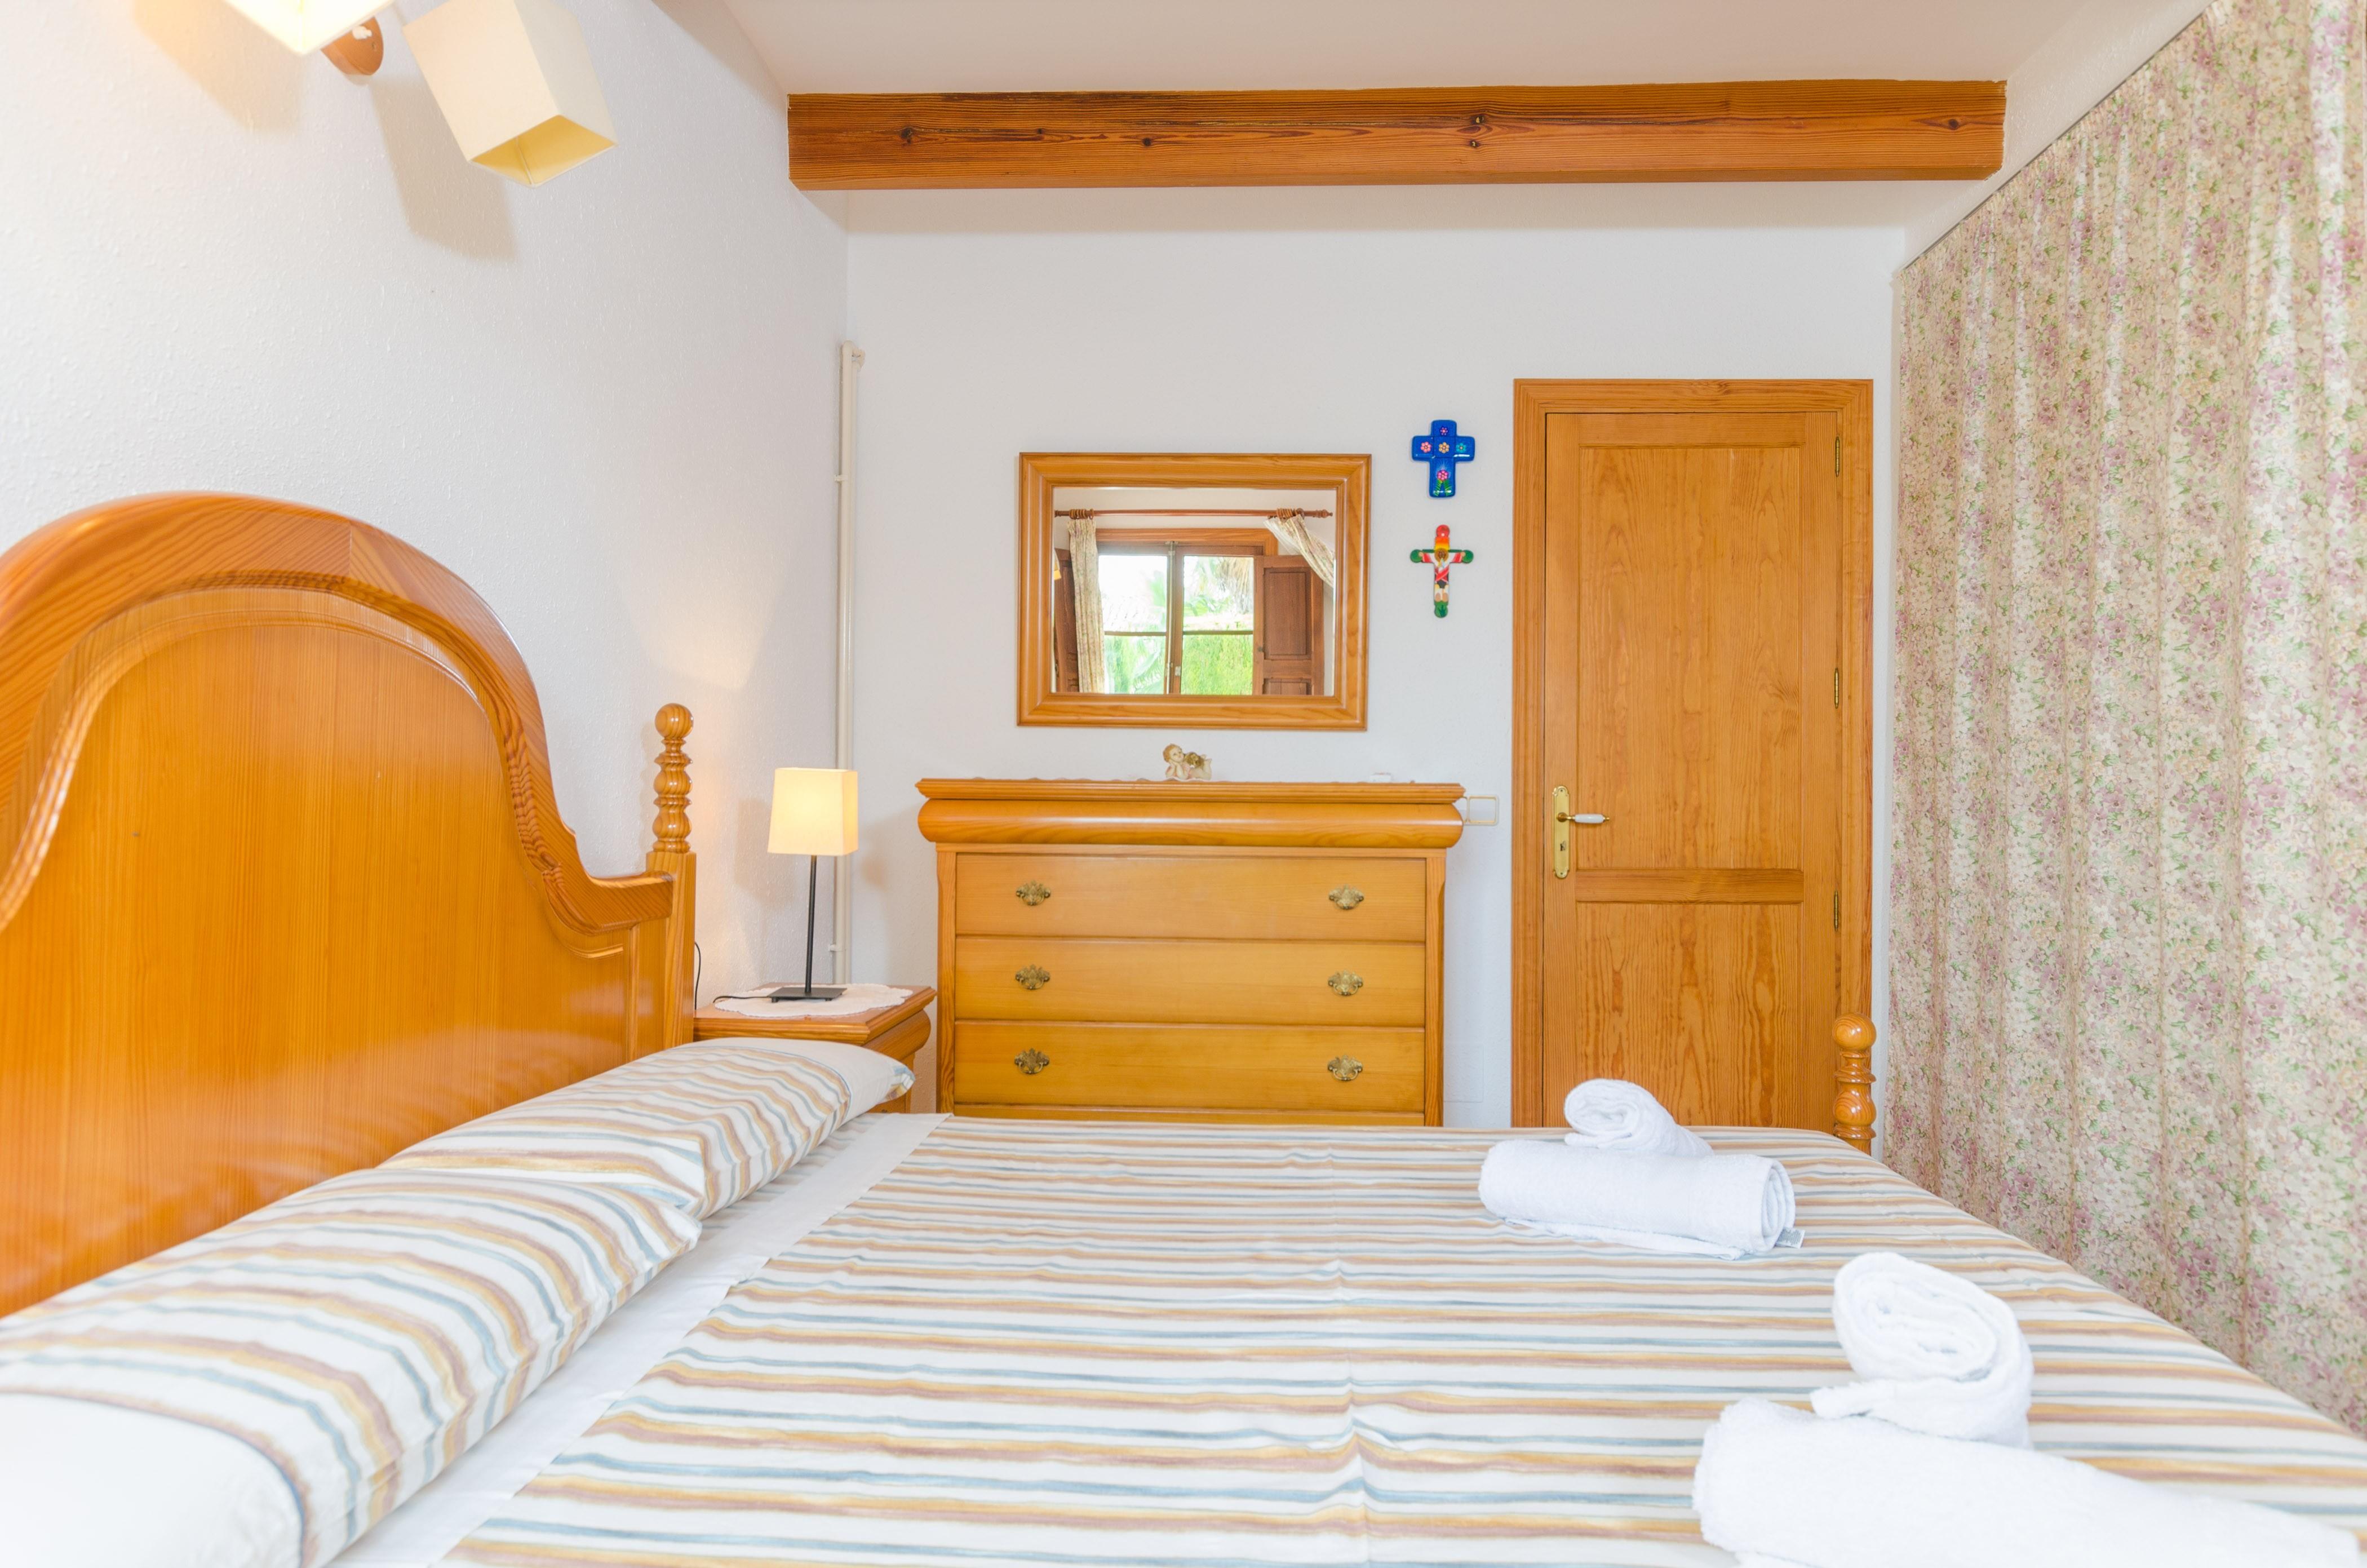 Maison de vacances SA SINIA (2374876), Lloret de Vistalegre, Majorque, Iles Baléares, Espagne, image 27